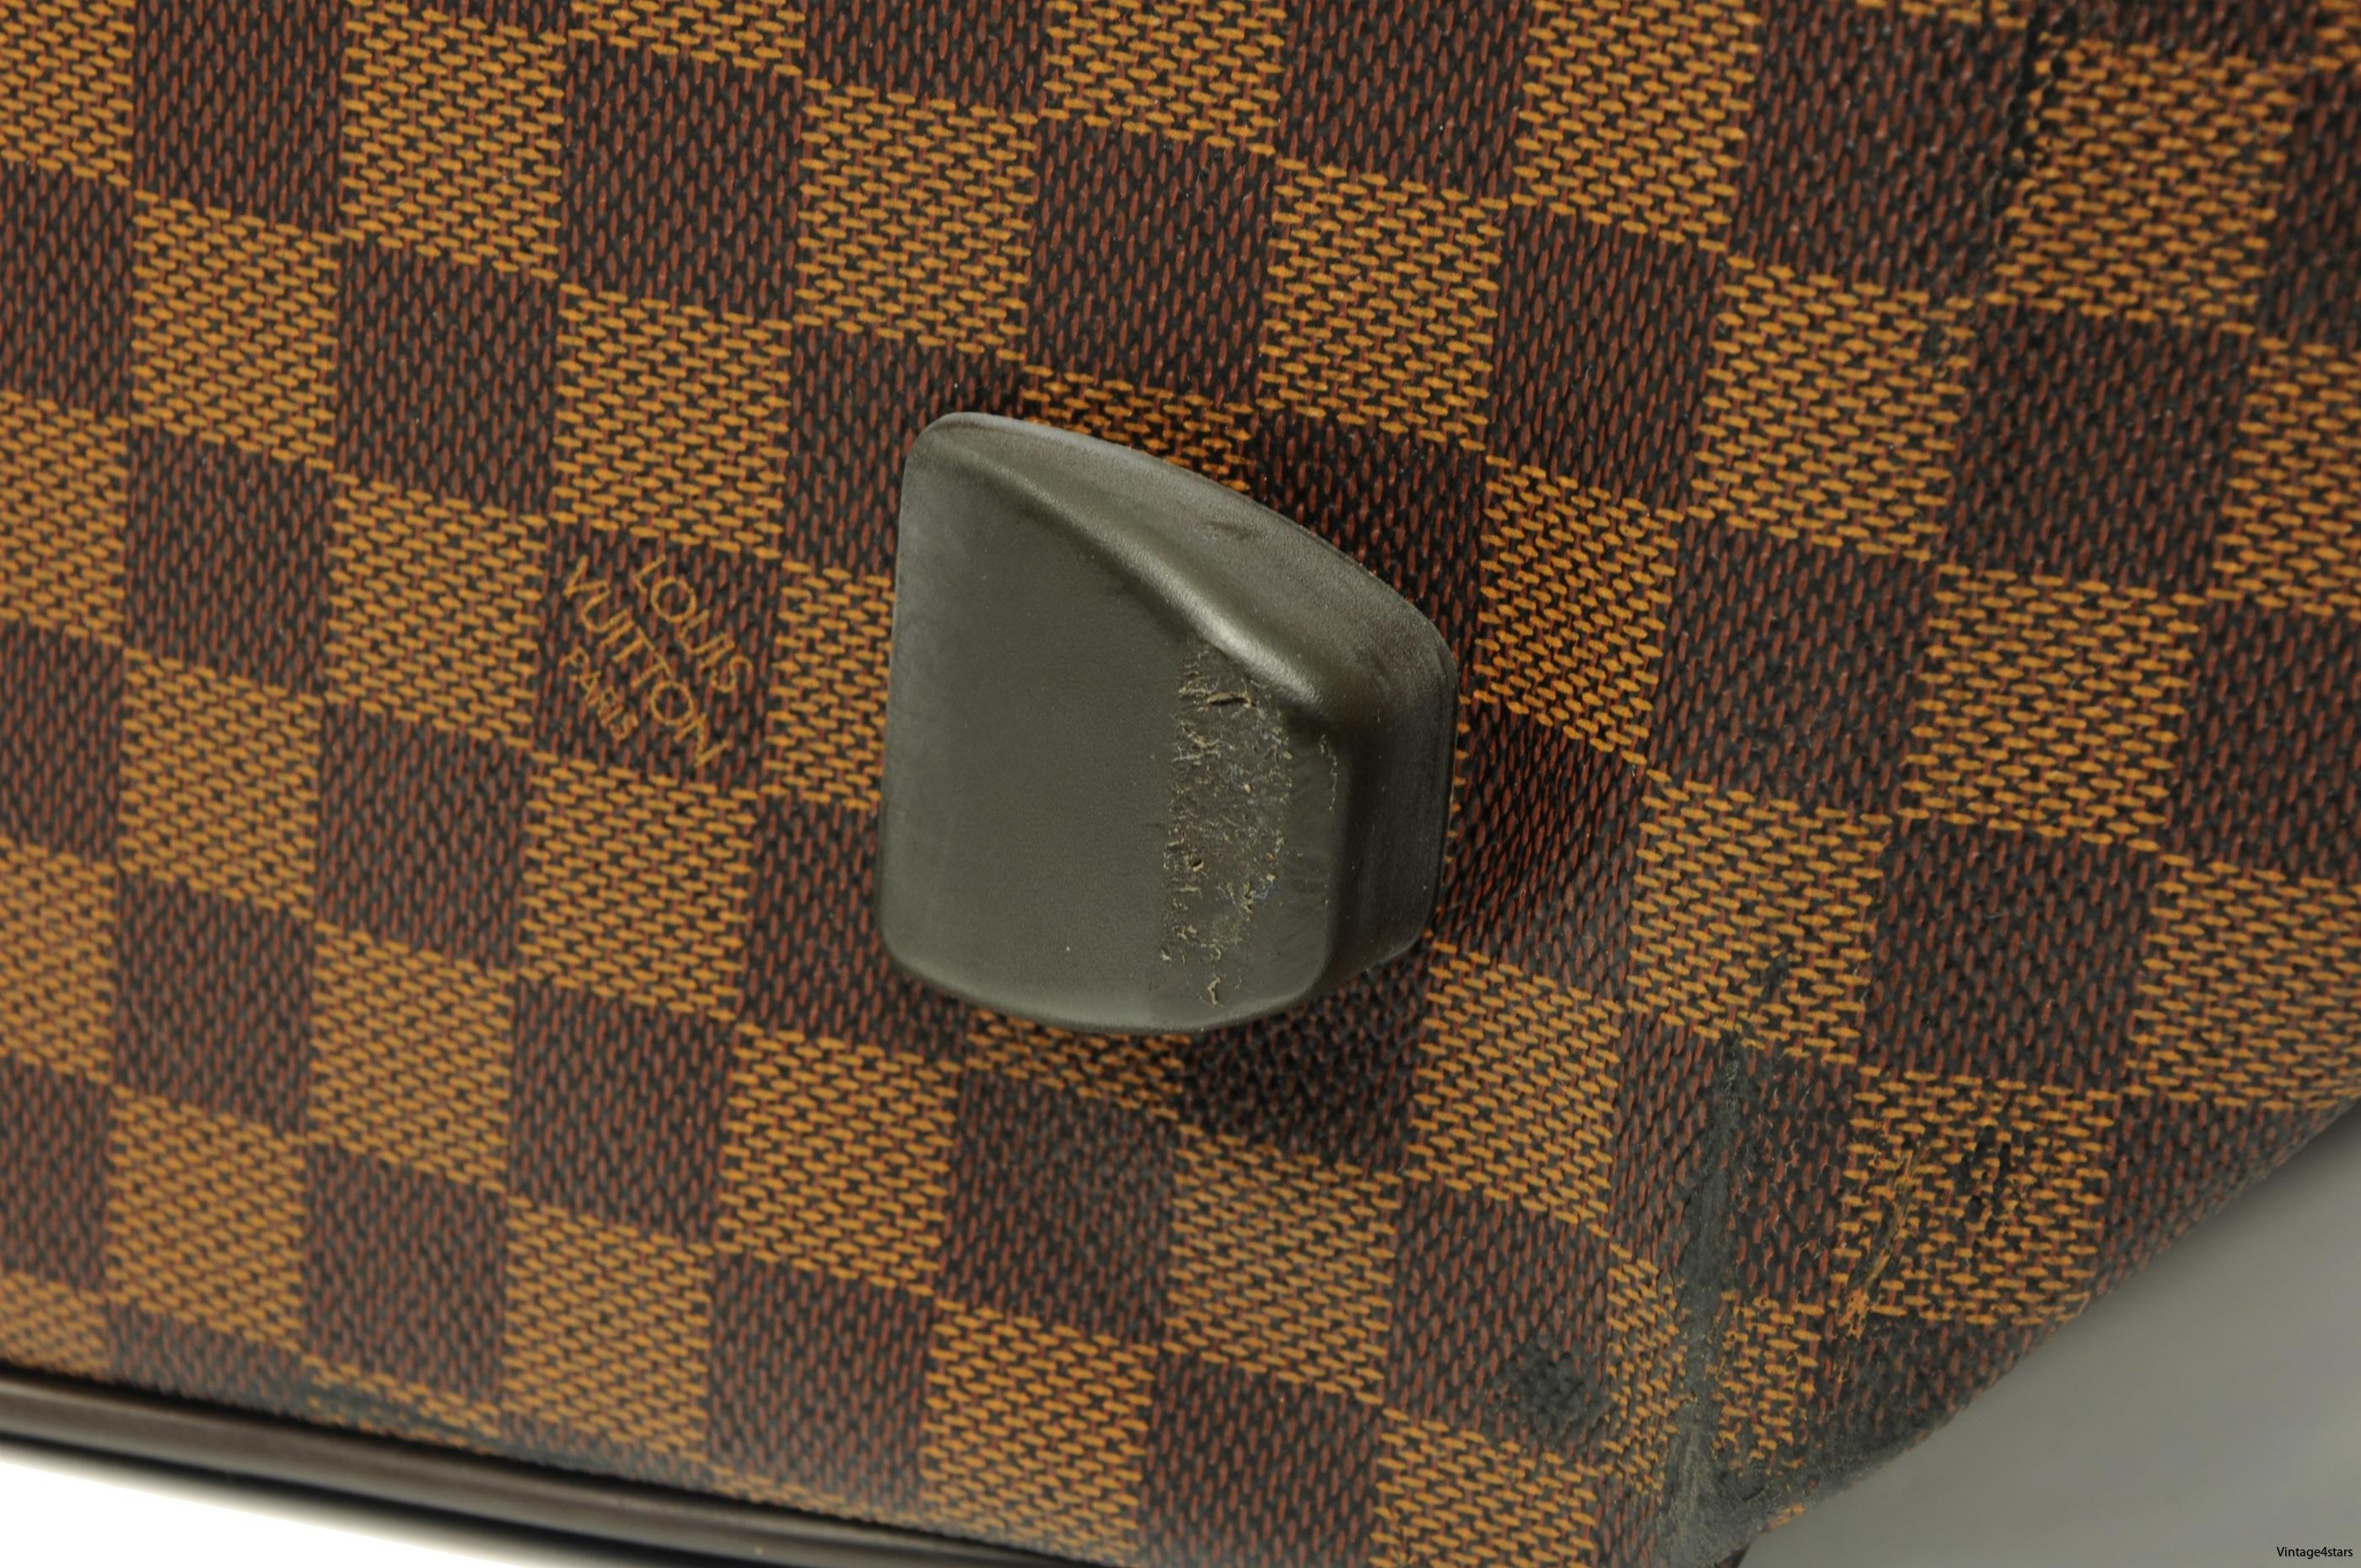 Louis Vuitton Eole 60 Damier Ebene 12